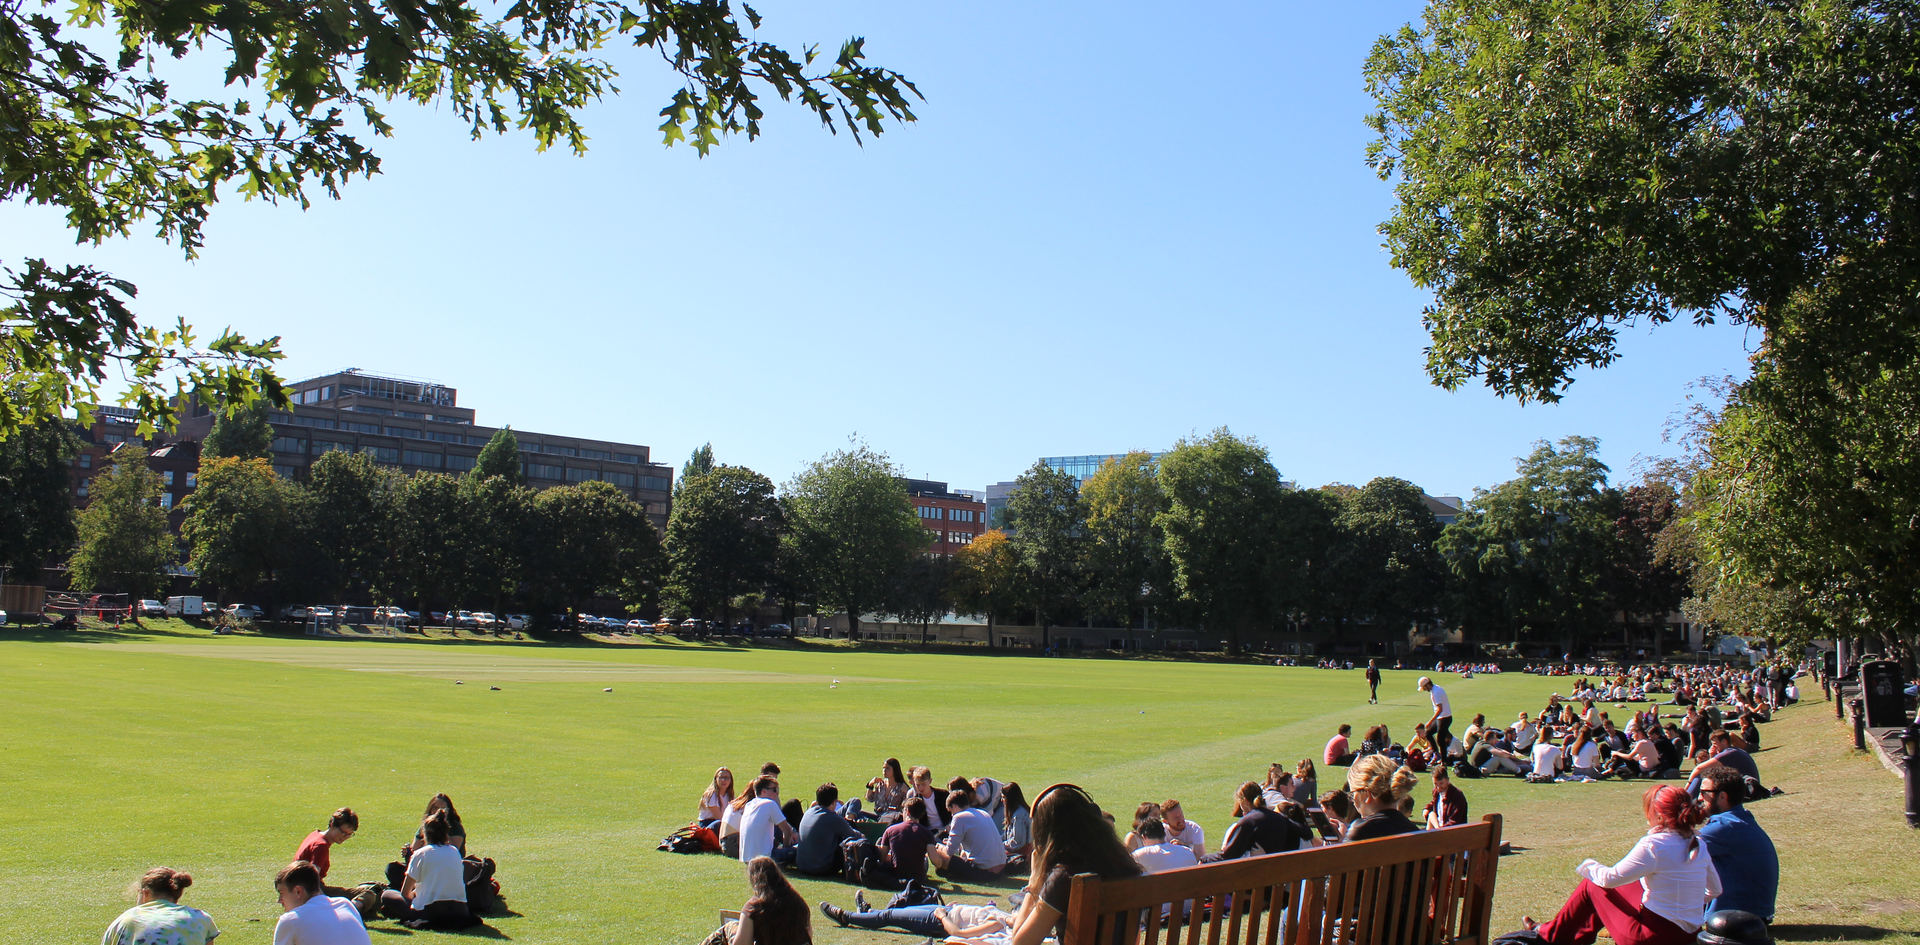 cricket pitch (1).JPG